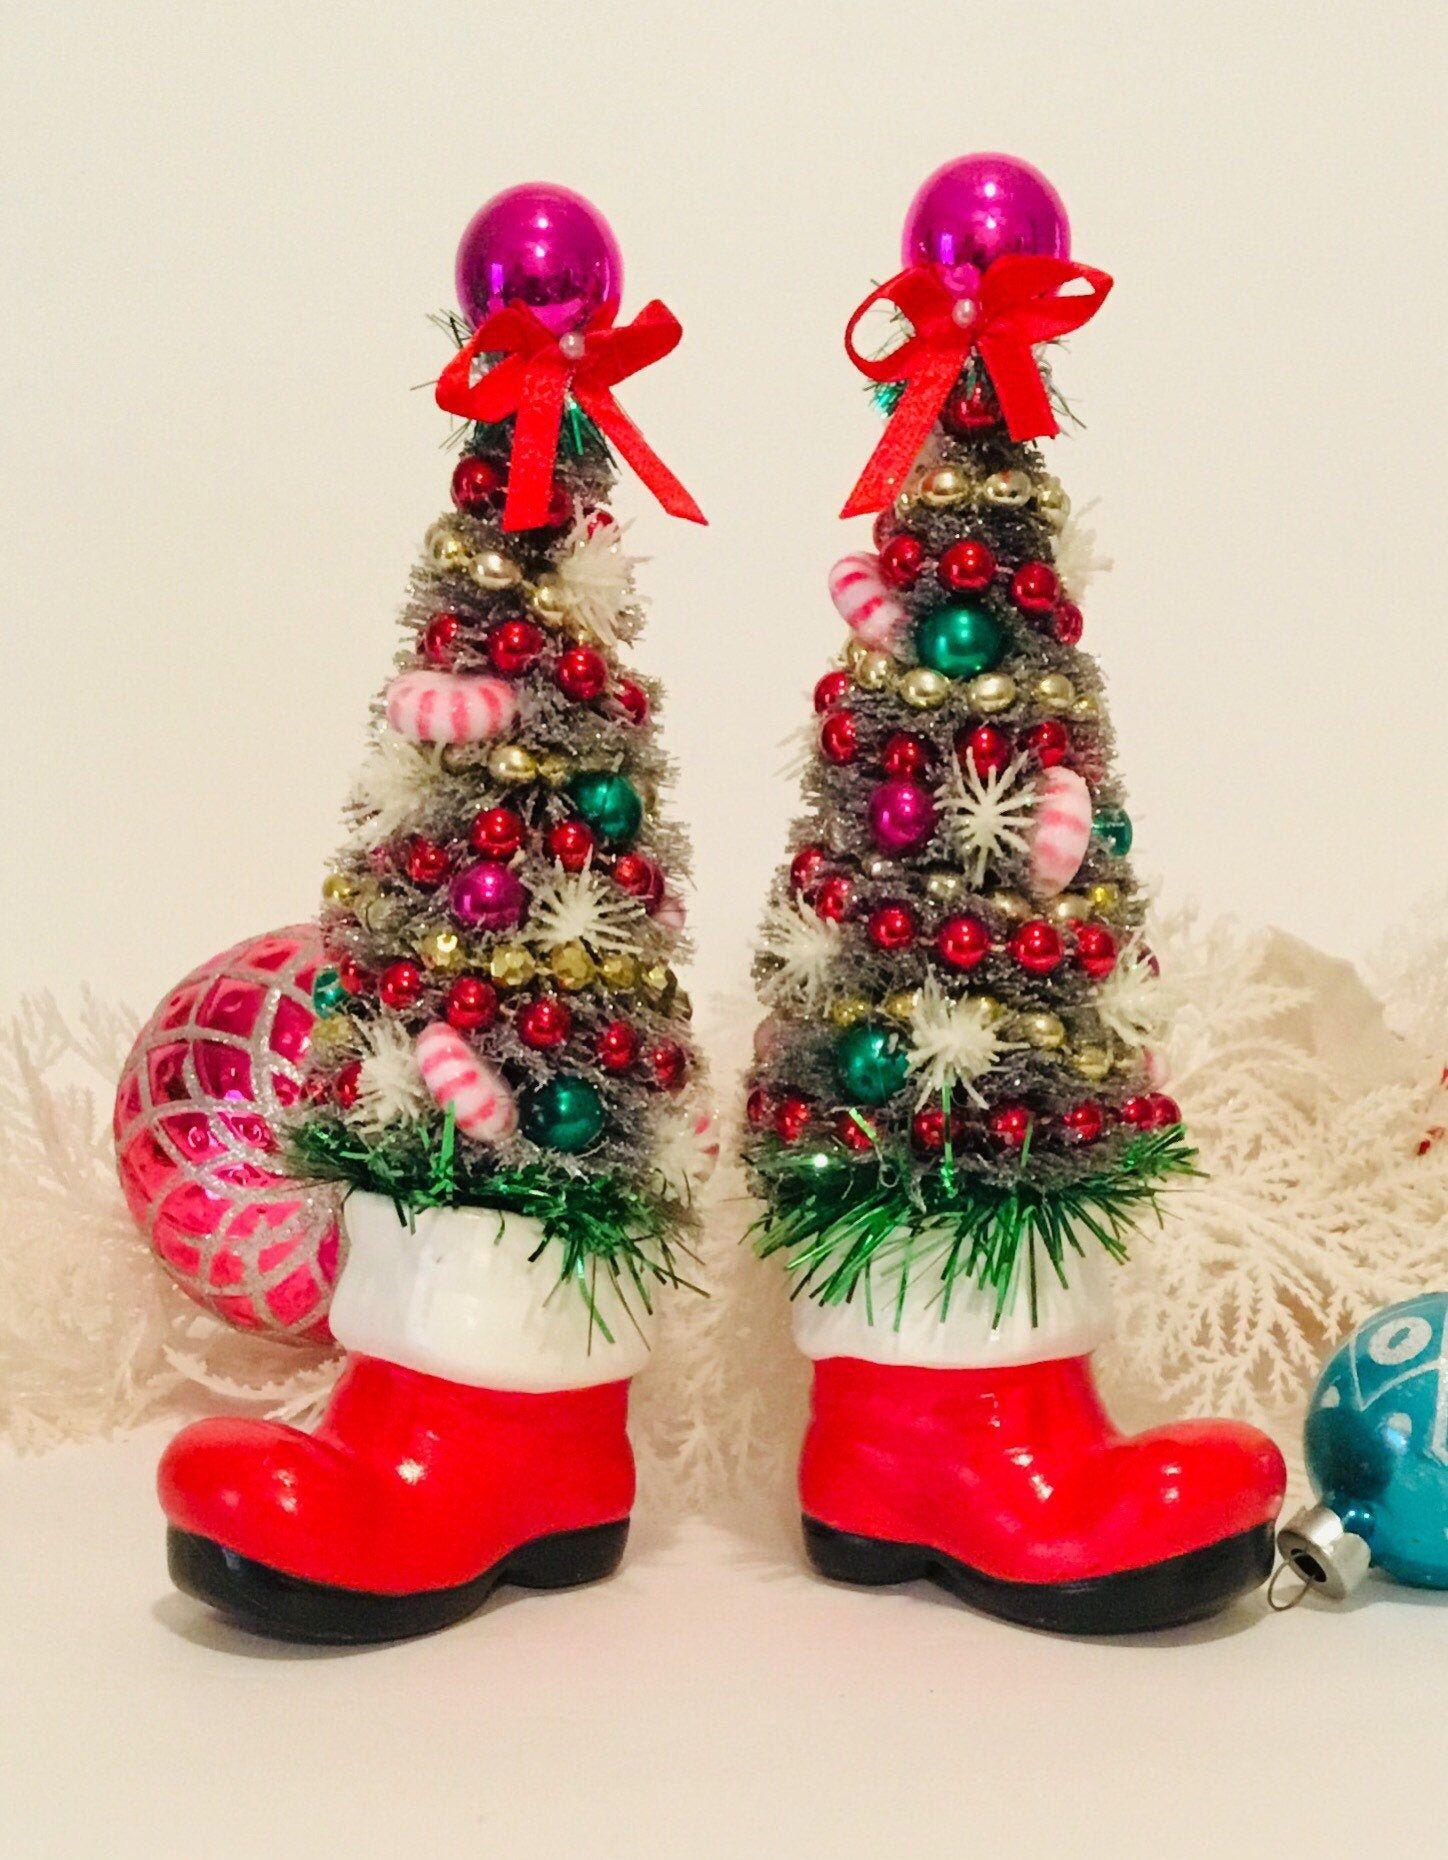 Santa Boot Bottle Brush Trees ~ Pair of Santa Boots, Vintage Santa Boots, Decorated Bottle Brush Tr